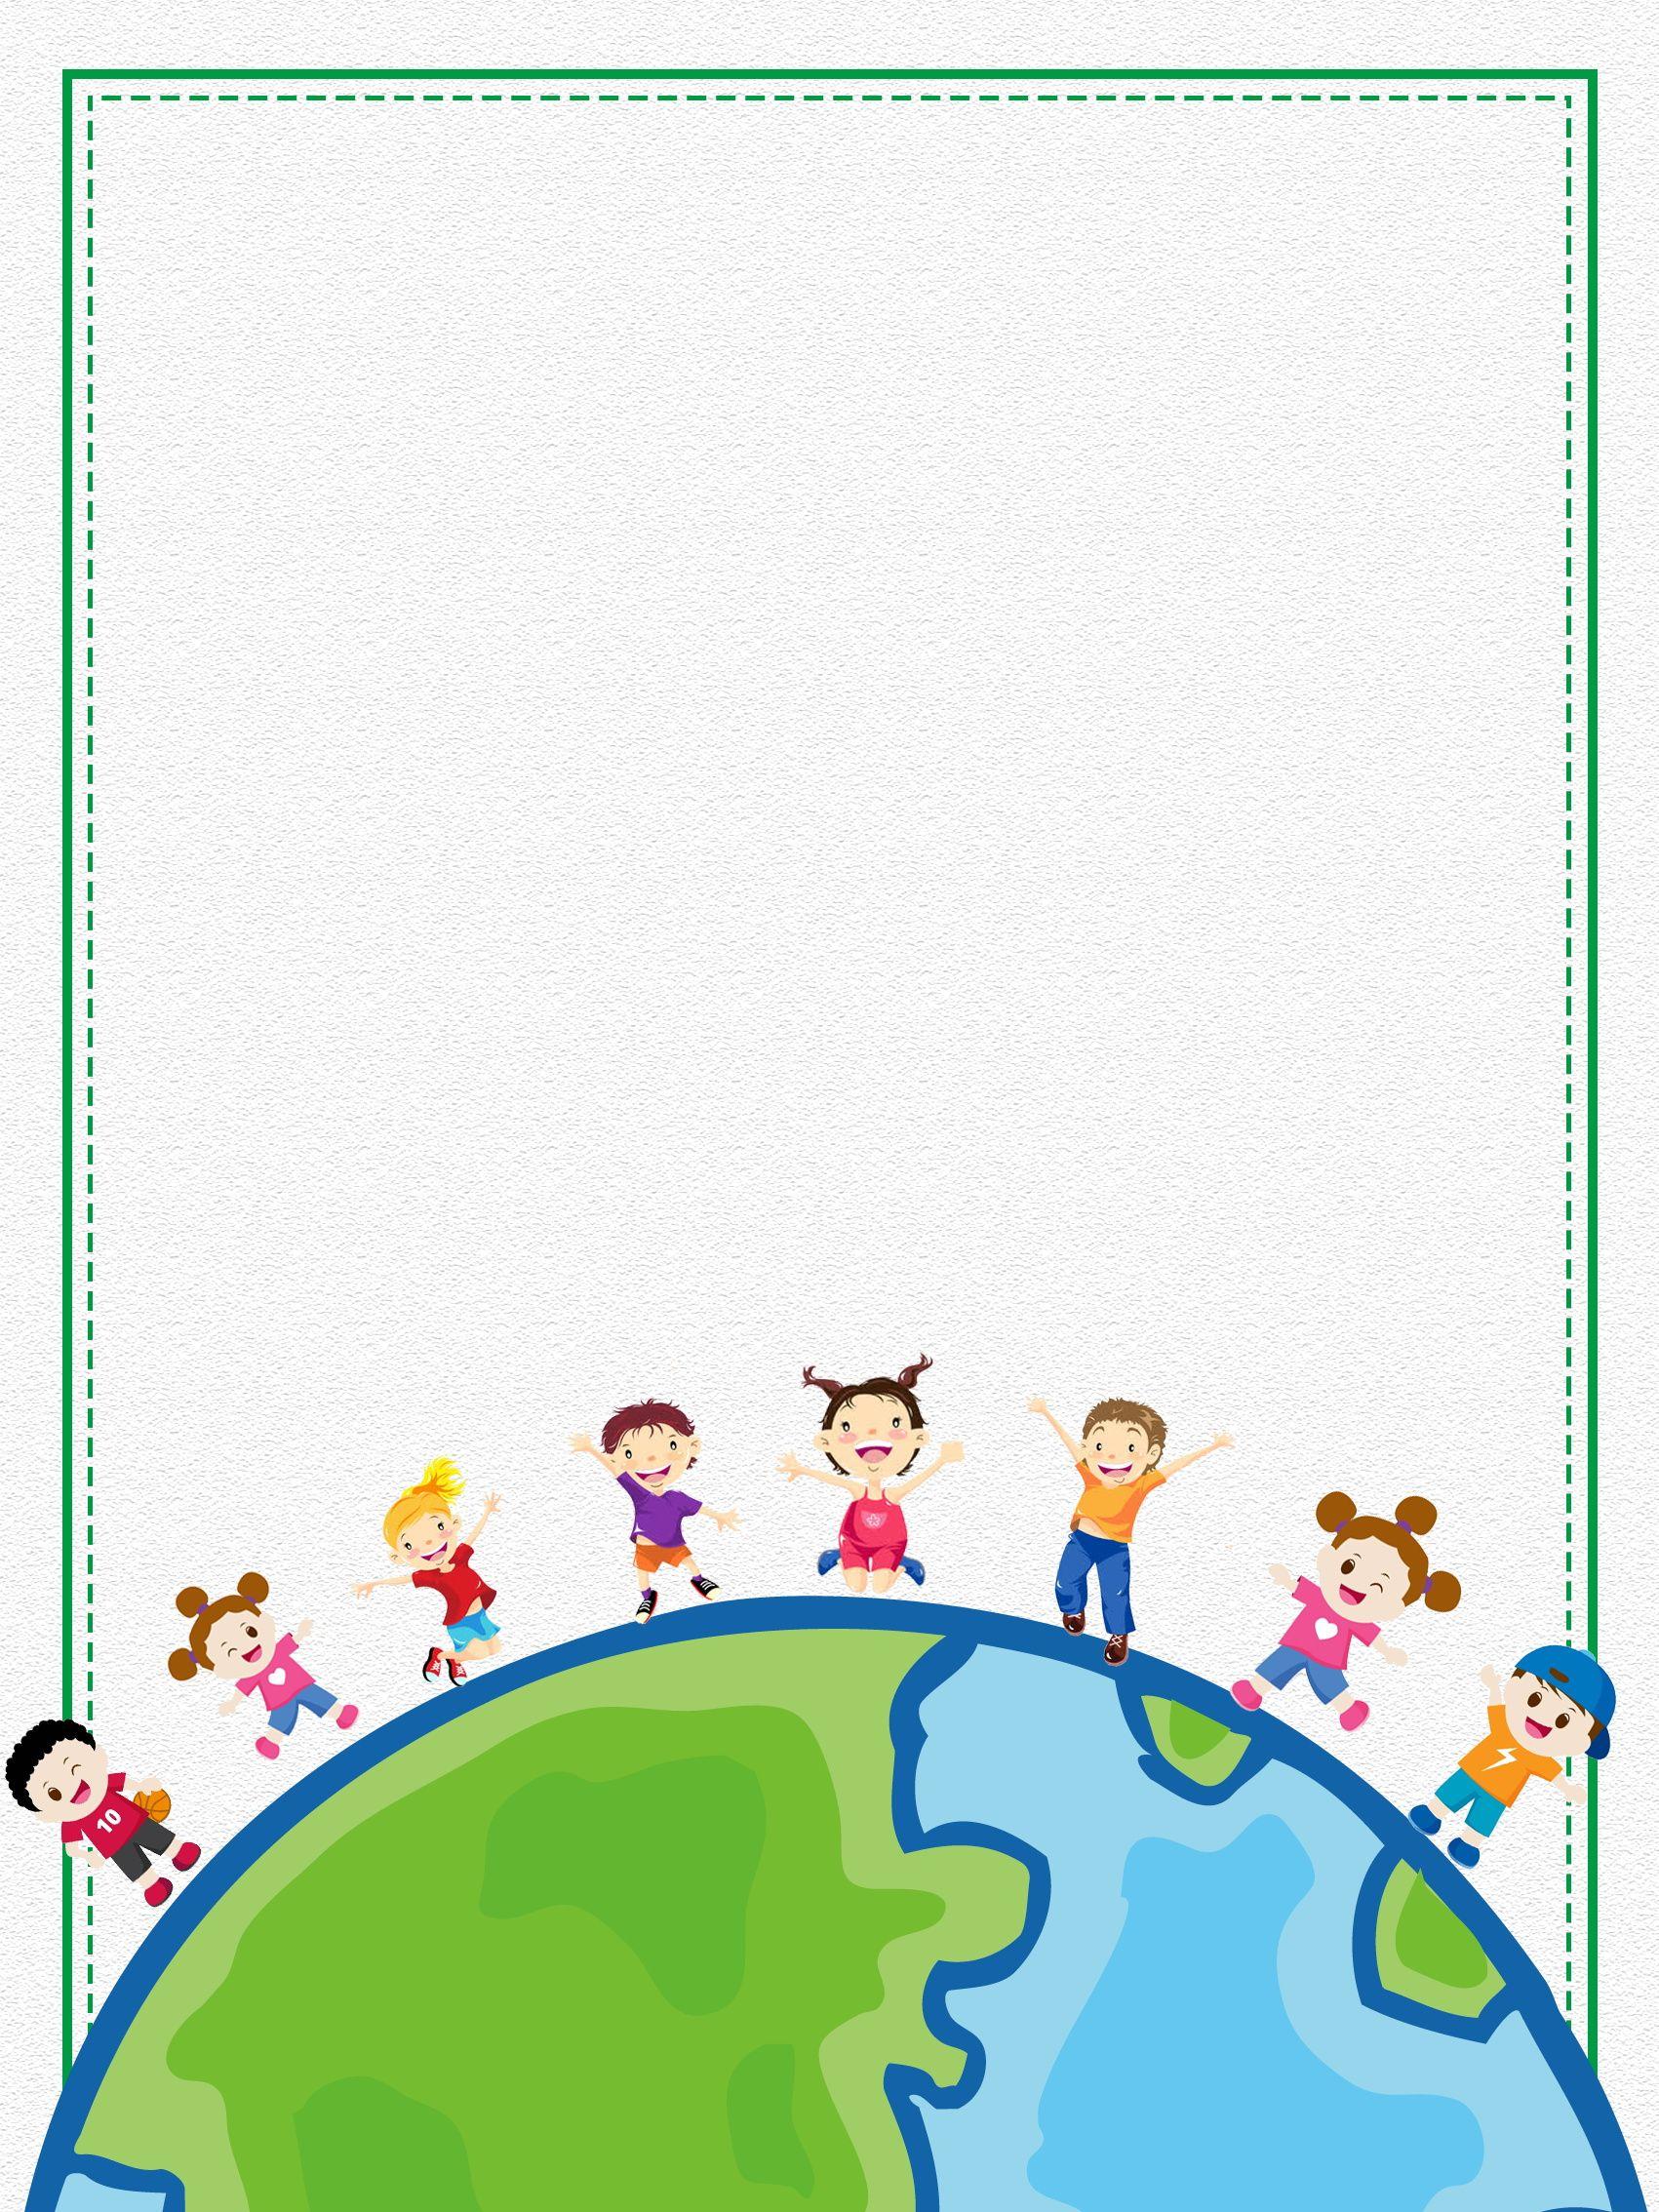 Painted International Childrens Day Background Design Desain Banner Latar Belakang Kreatif